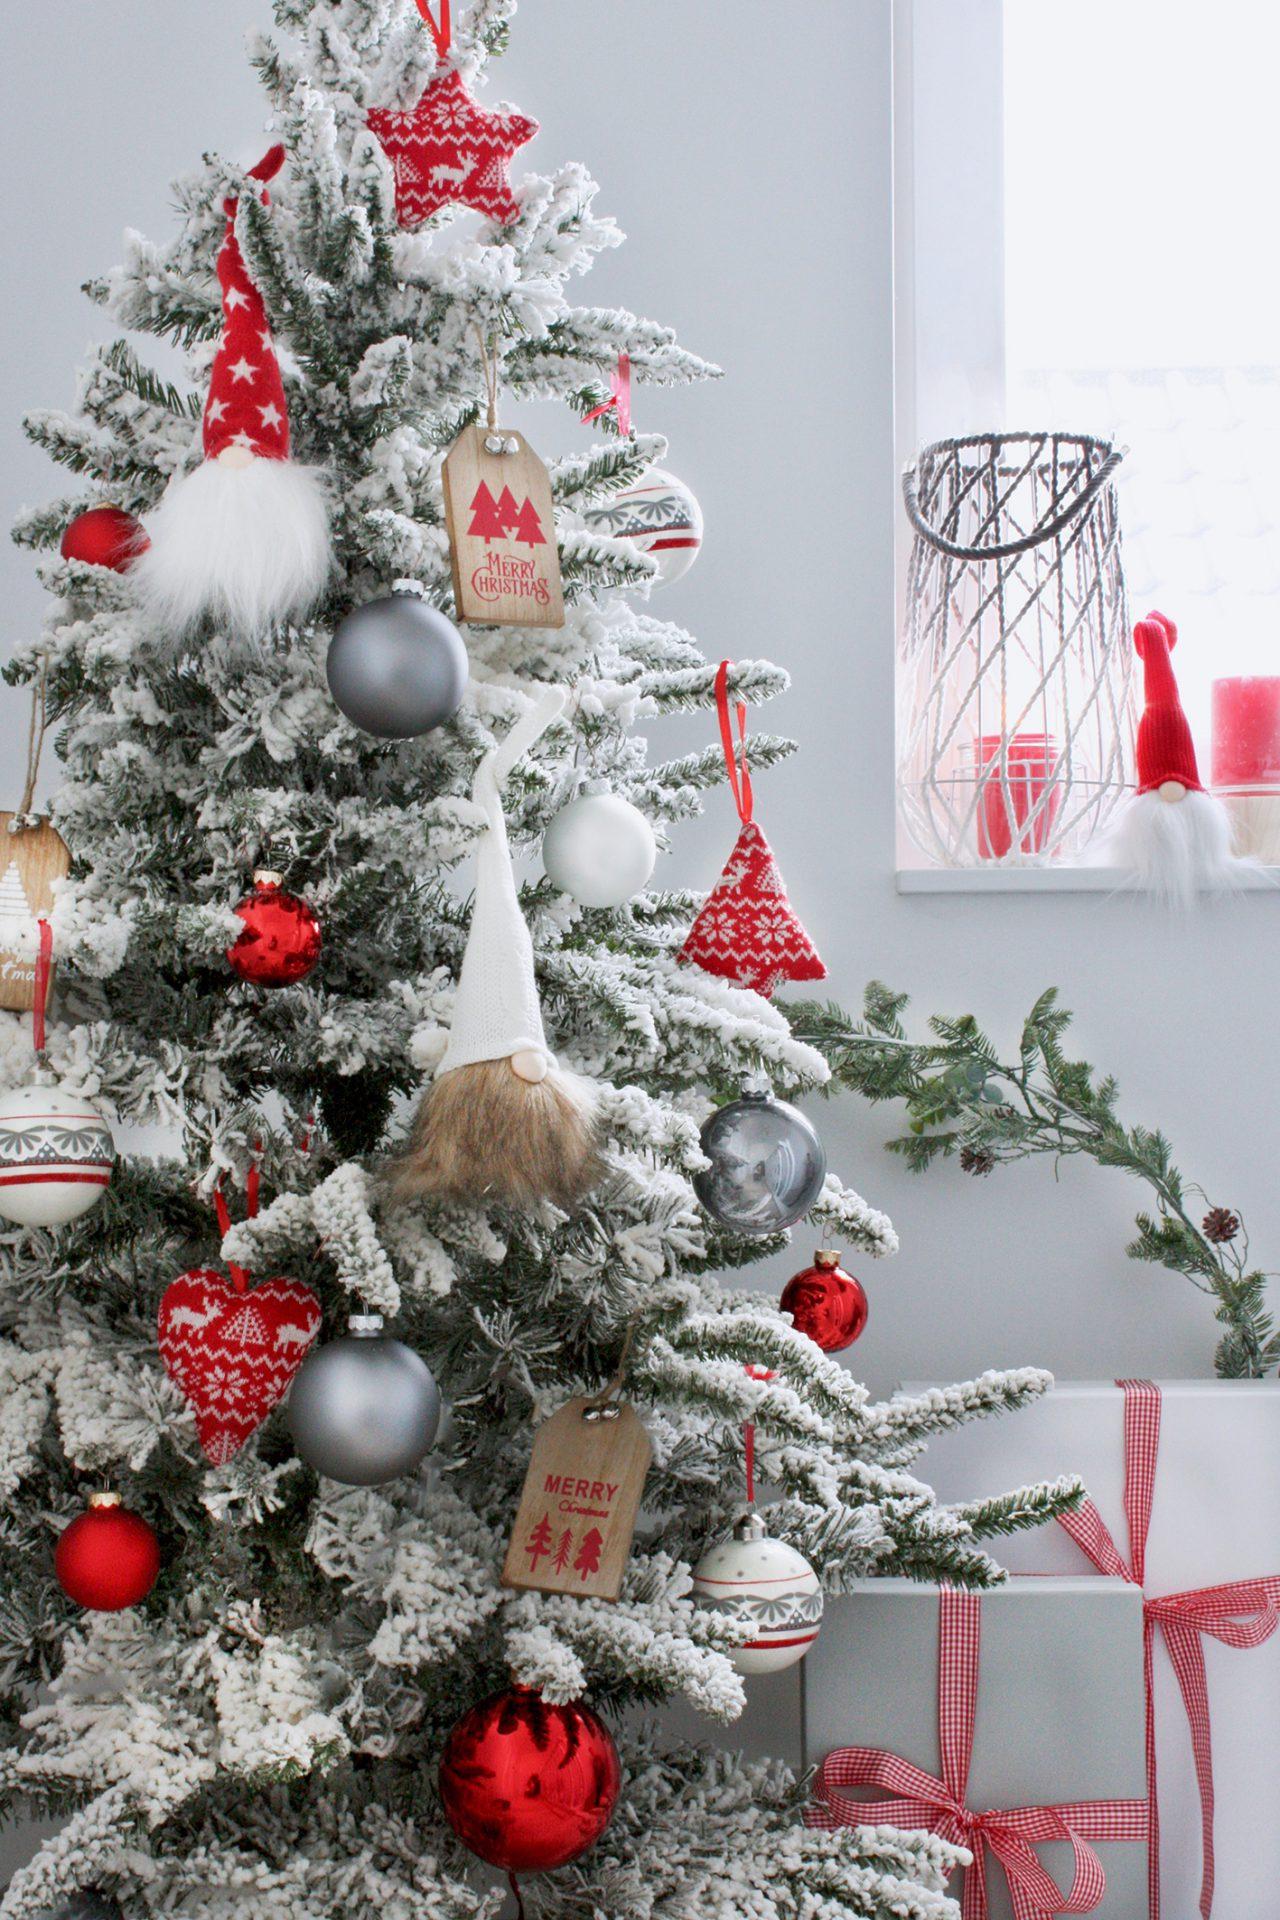 Dansk Jul stijlconcept kerstdecoratie